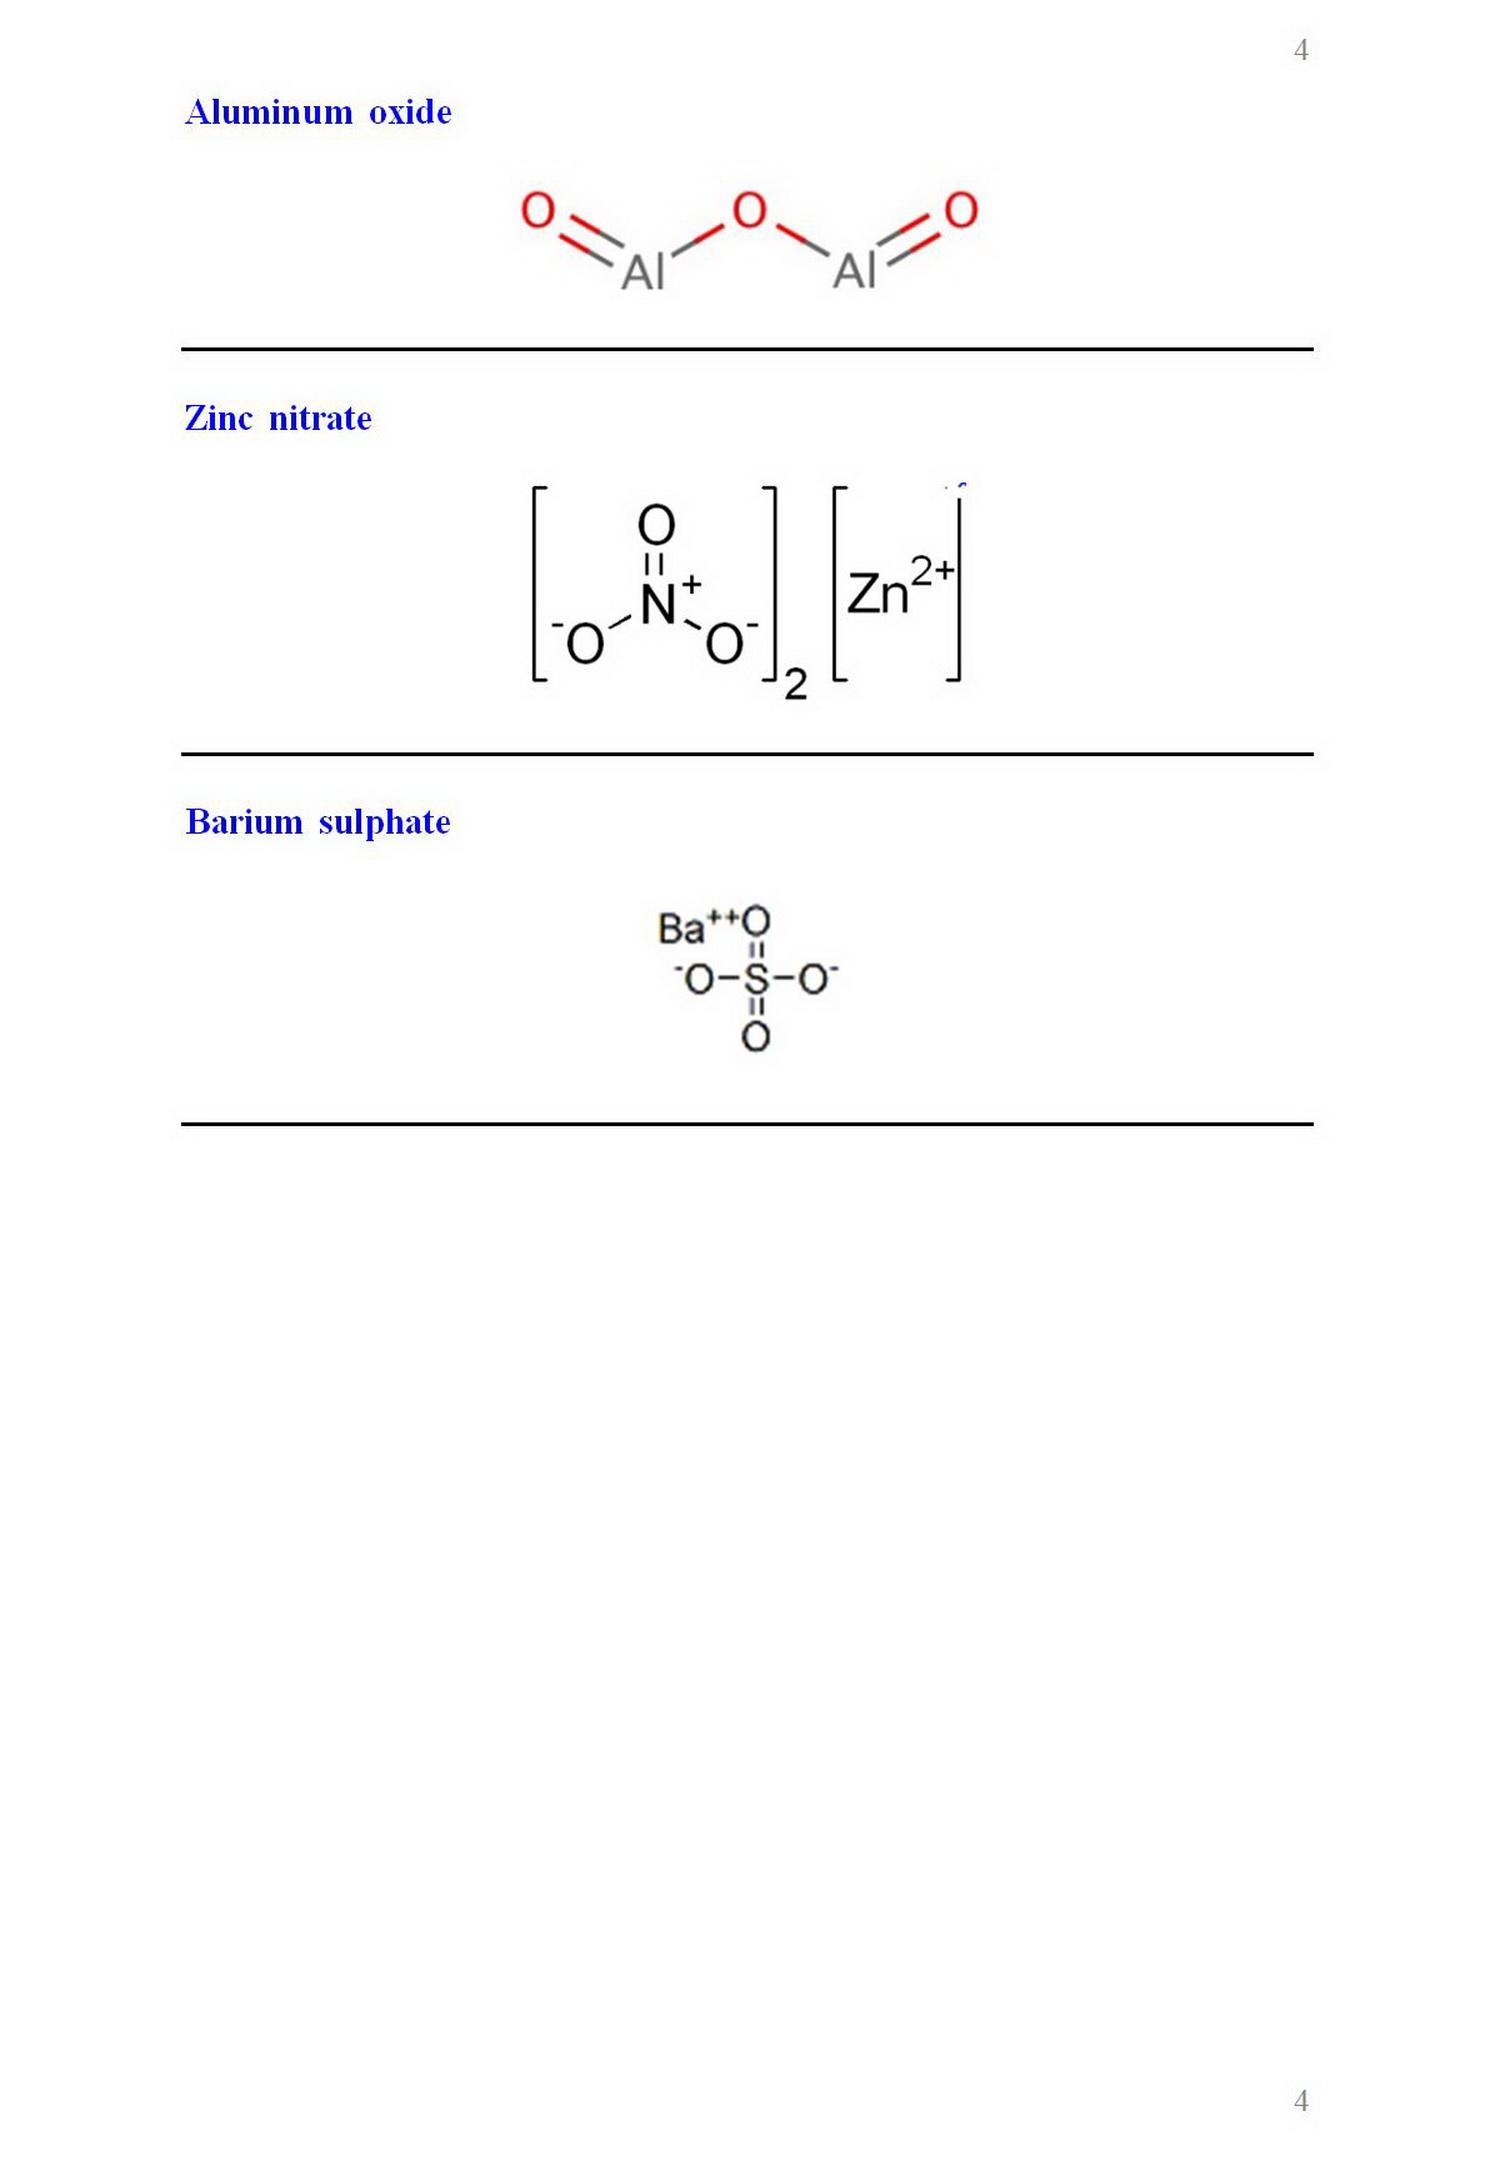 IB Chemistry SL & HL: 4.1 - Formulas of Metals with ...